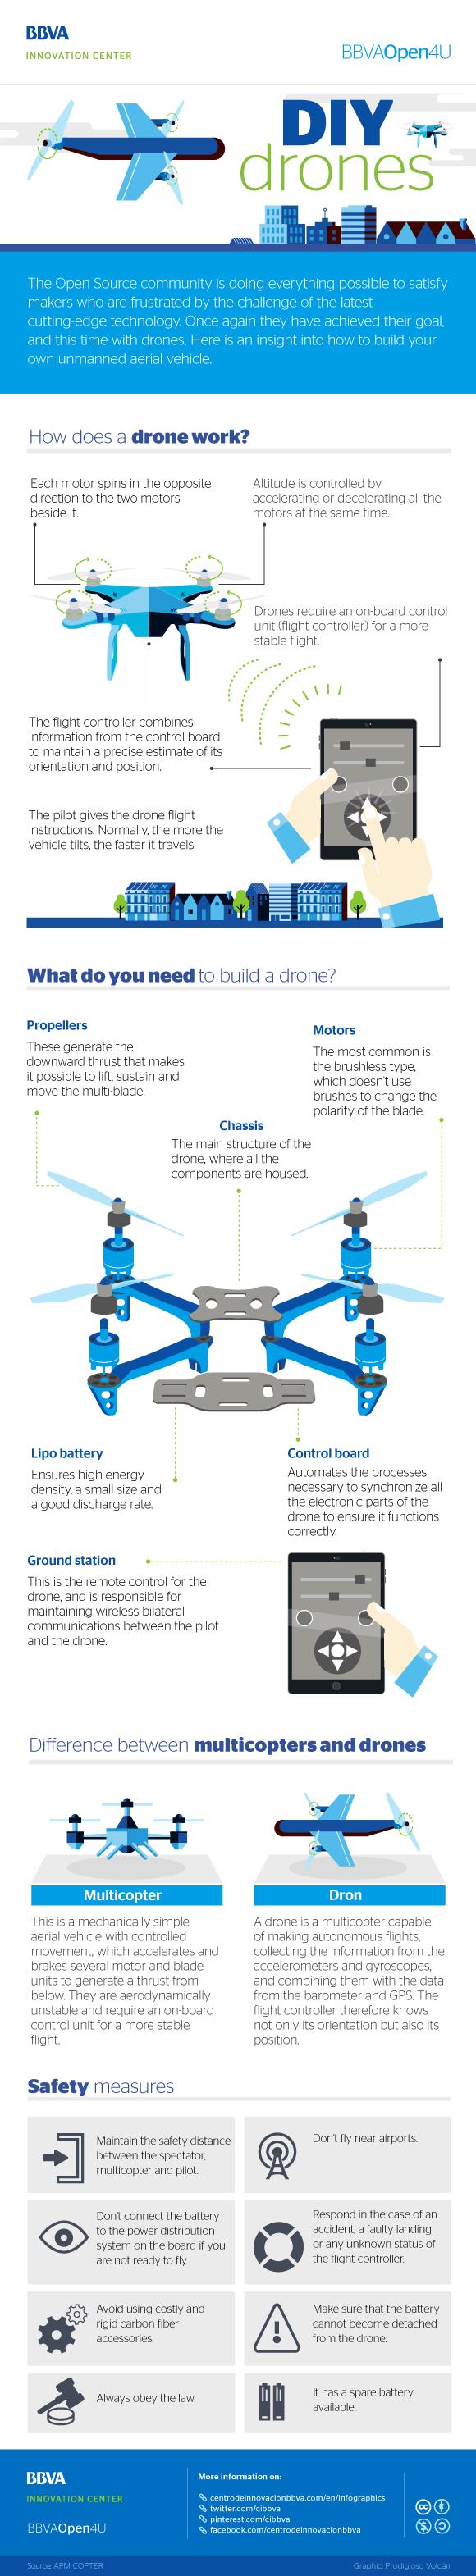 Infographic: DIY dron